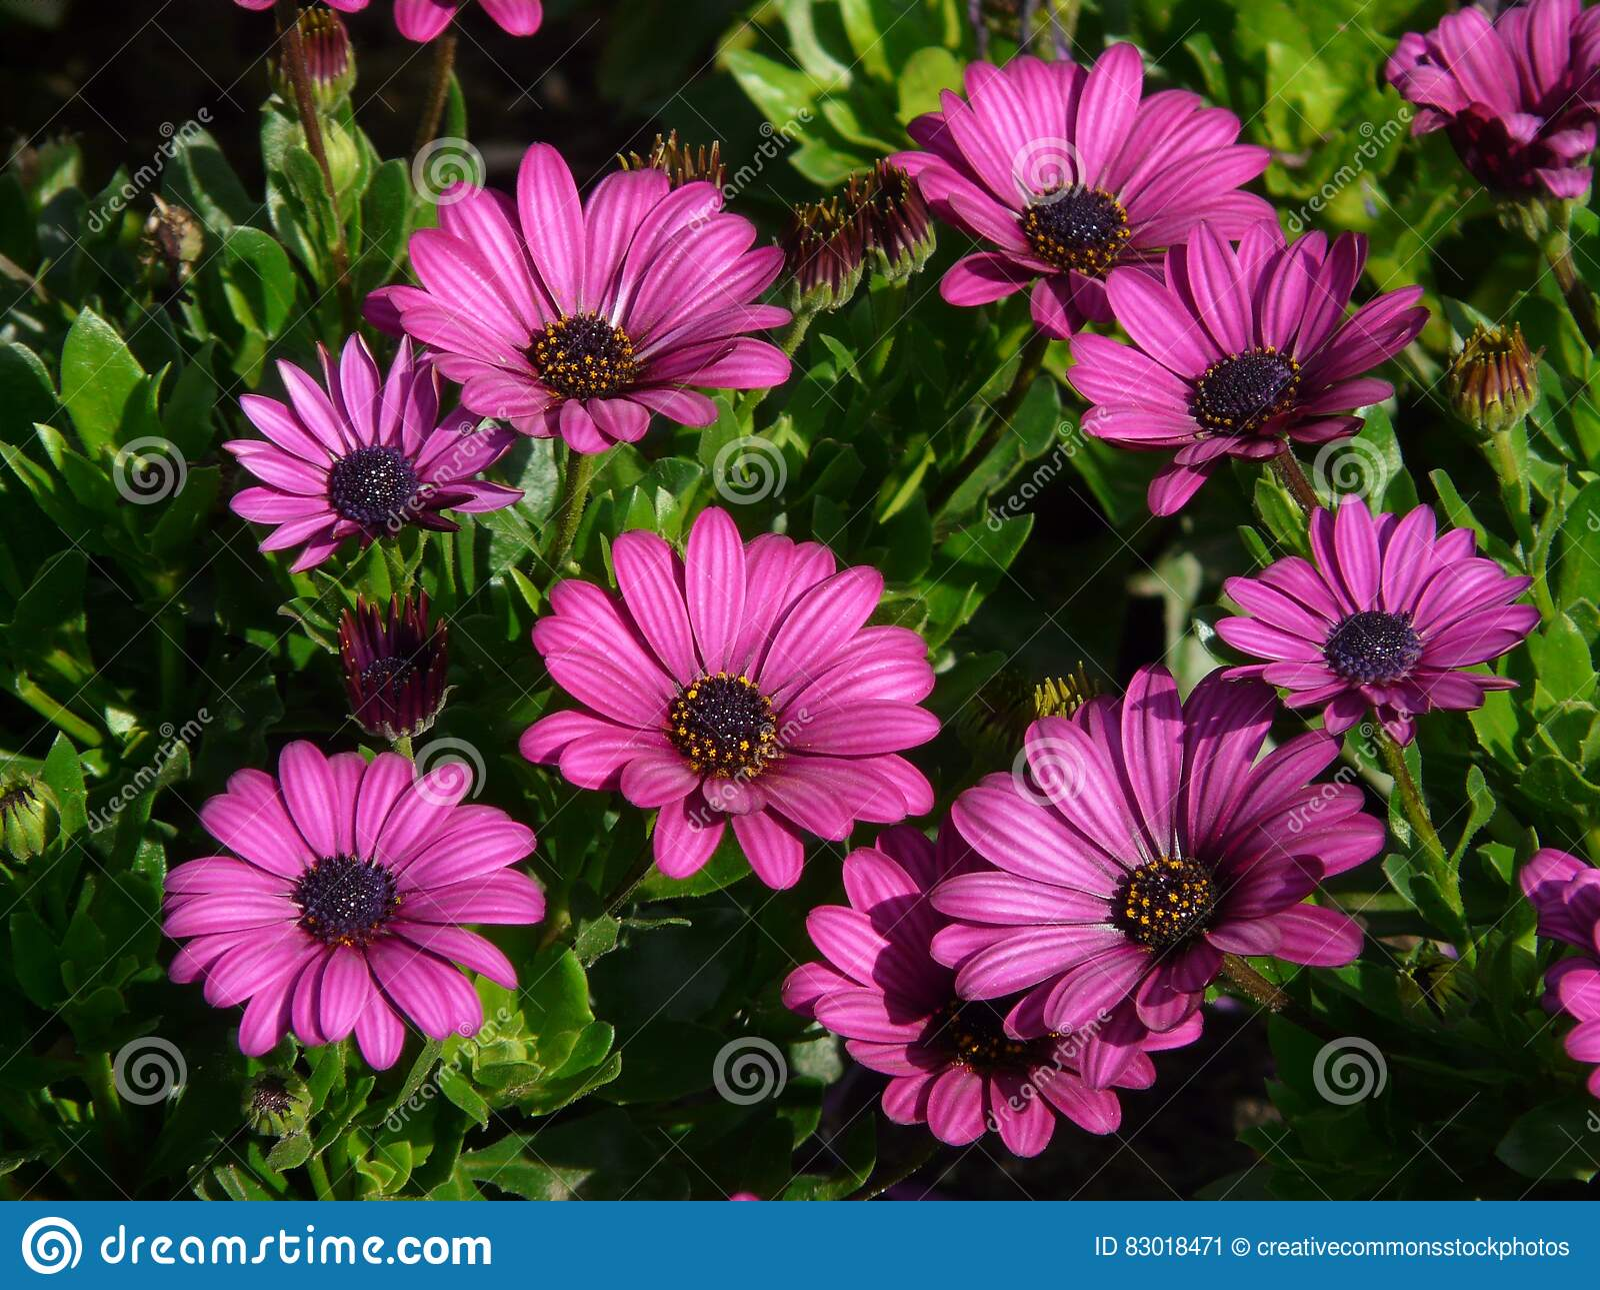 Download Purple Petal Flowers During Daytime Stock Image - Image of purple, flowers: 83018471